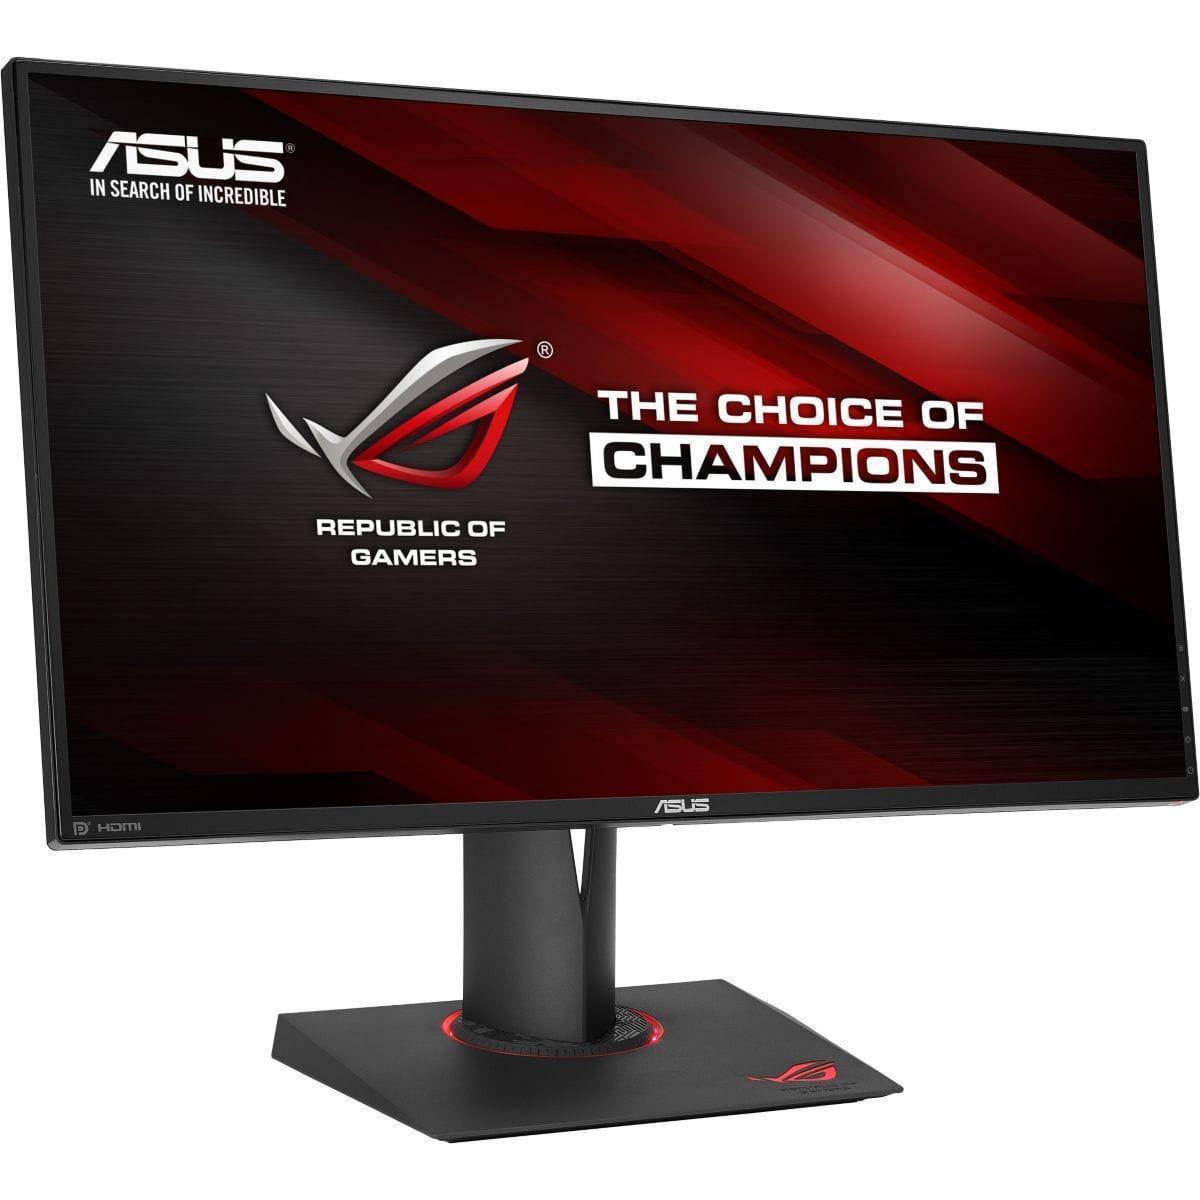 27-inch Asus Rog Swift PG279Q 2560 x 1440 LCD Monitor Black